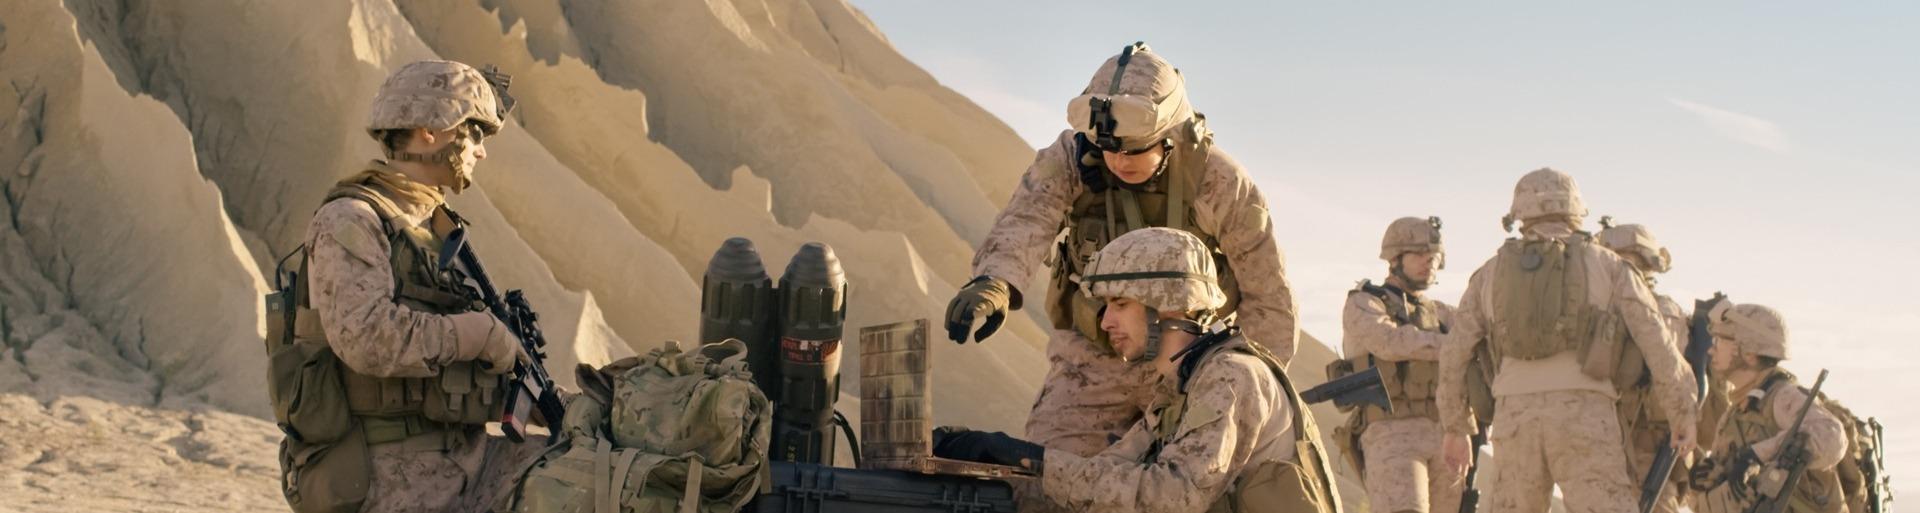 Militairen op missie